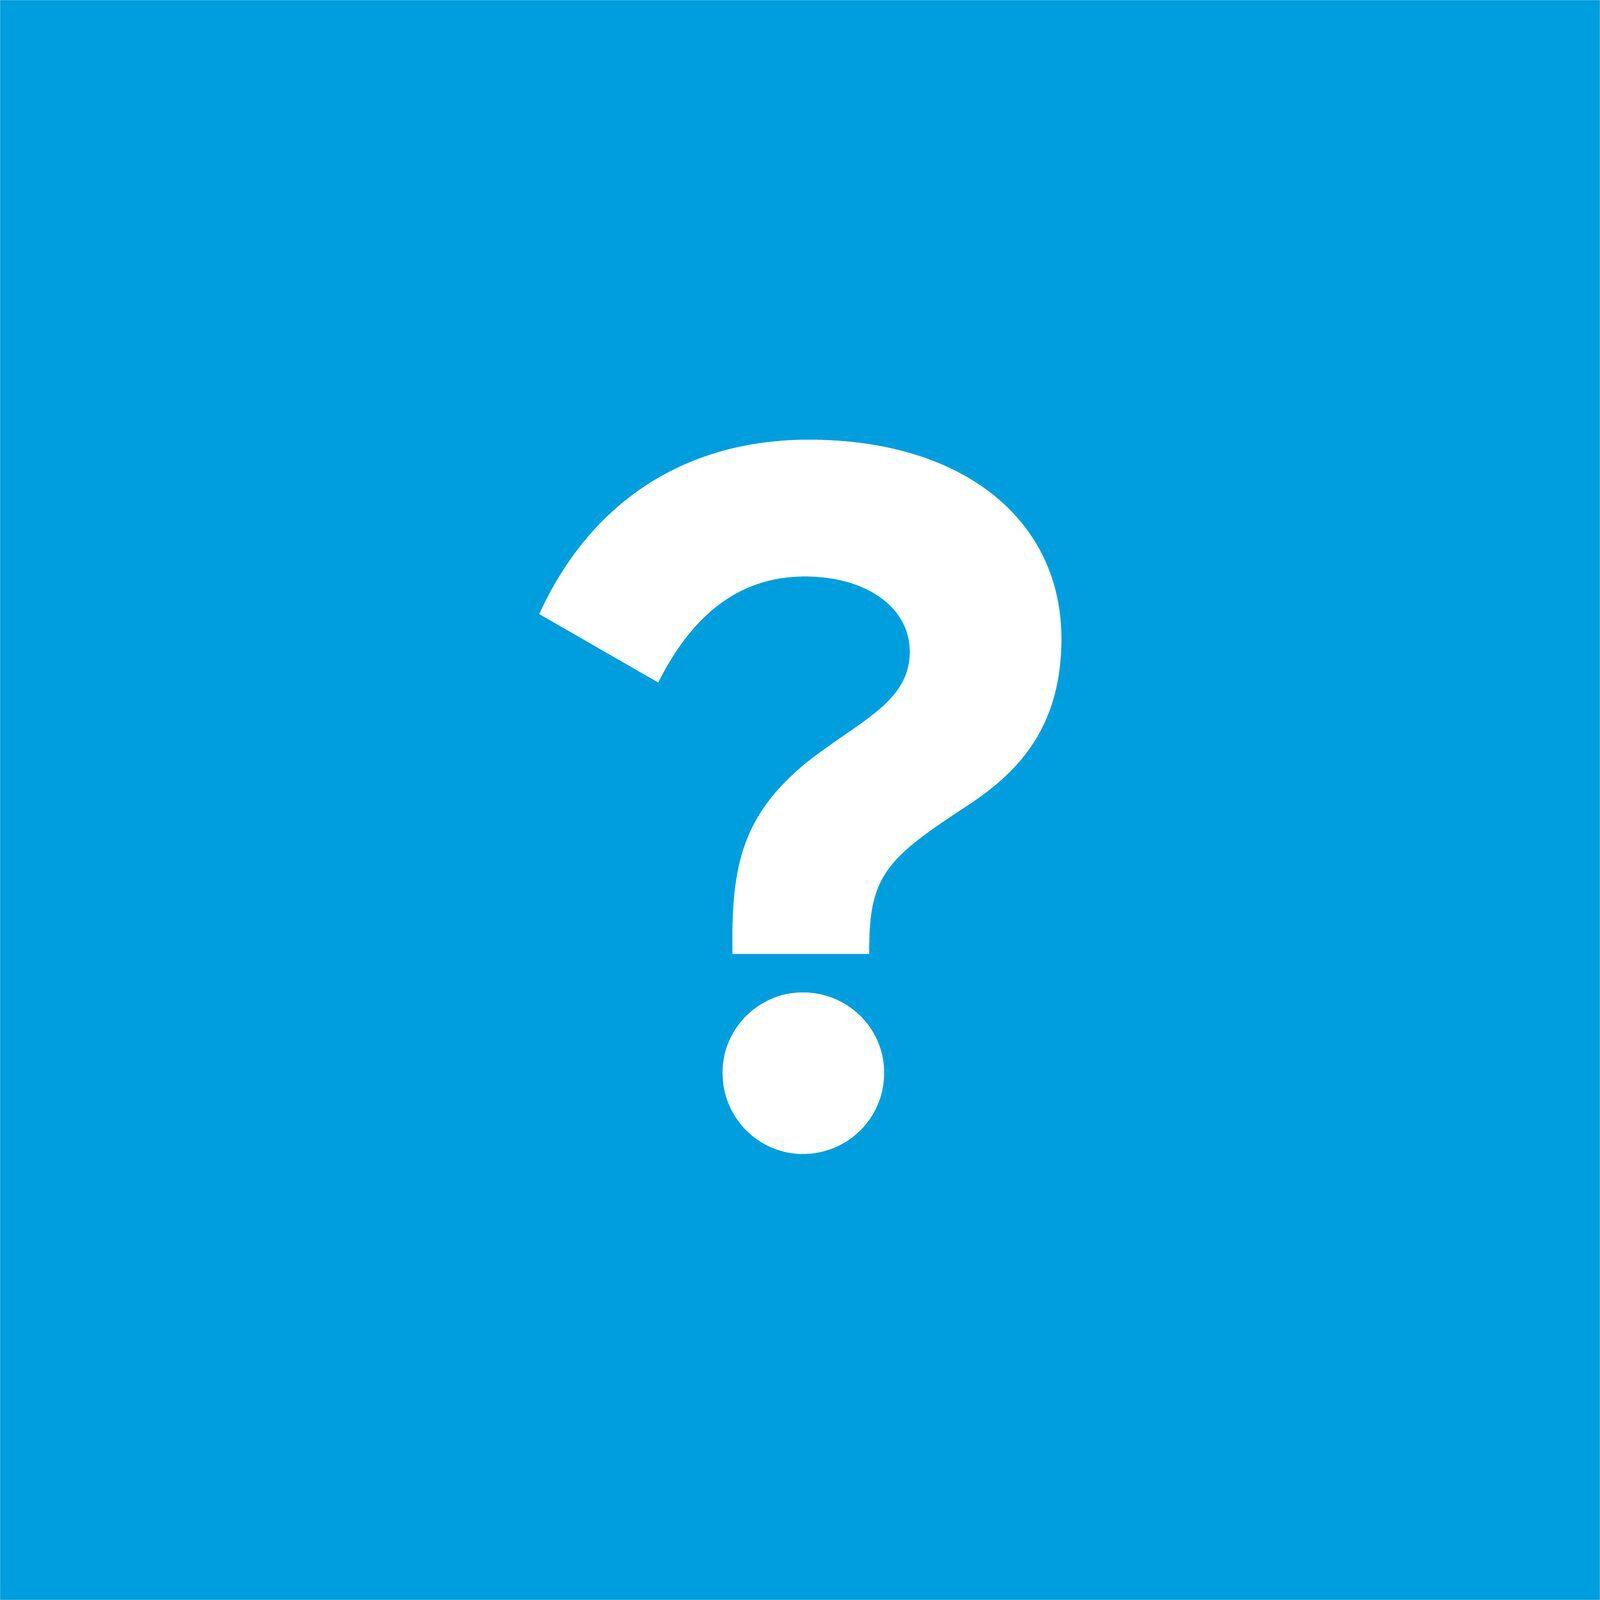 Vraag huisstijl TopParken